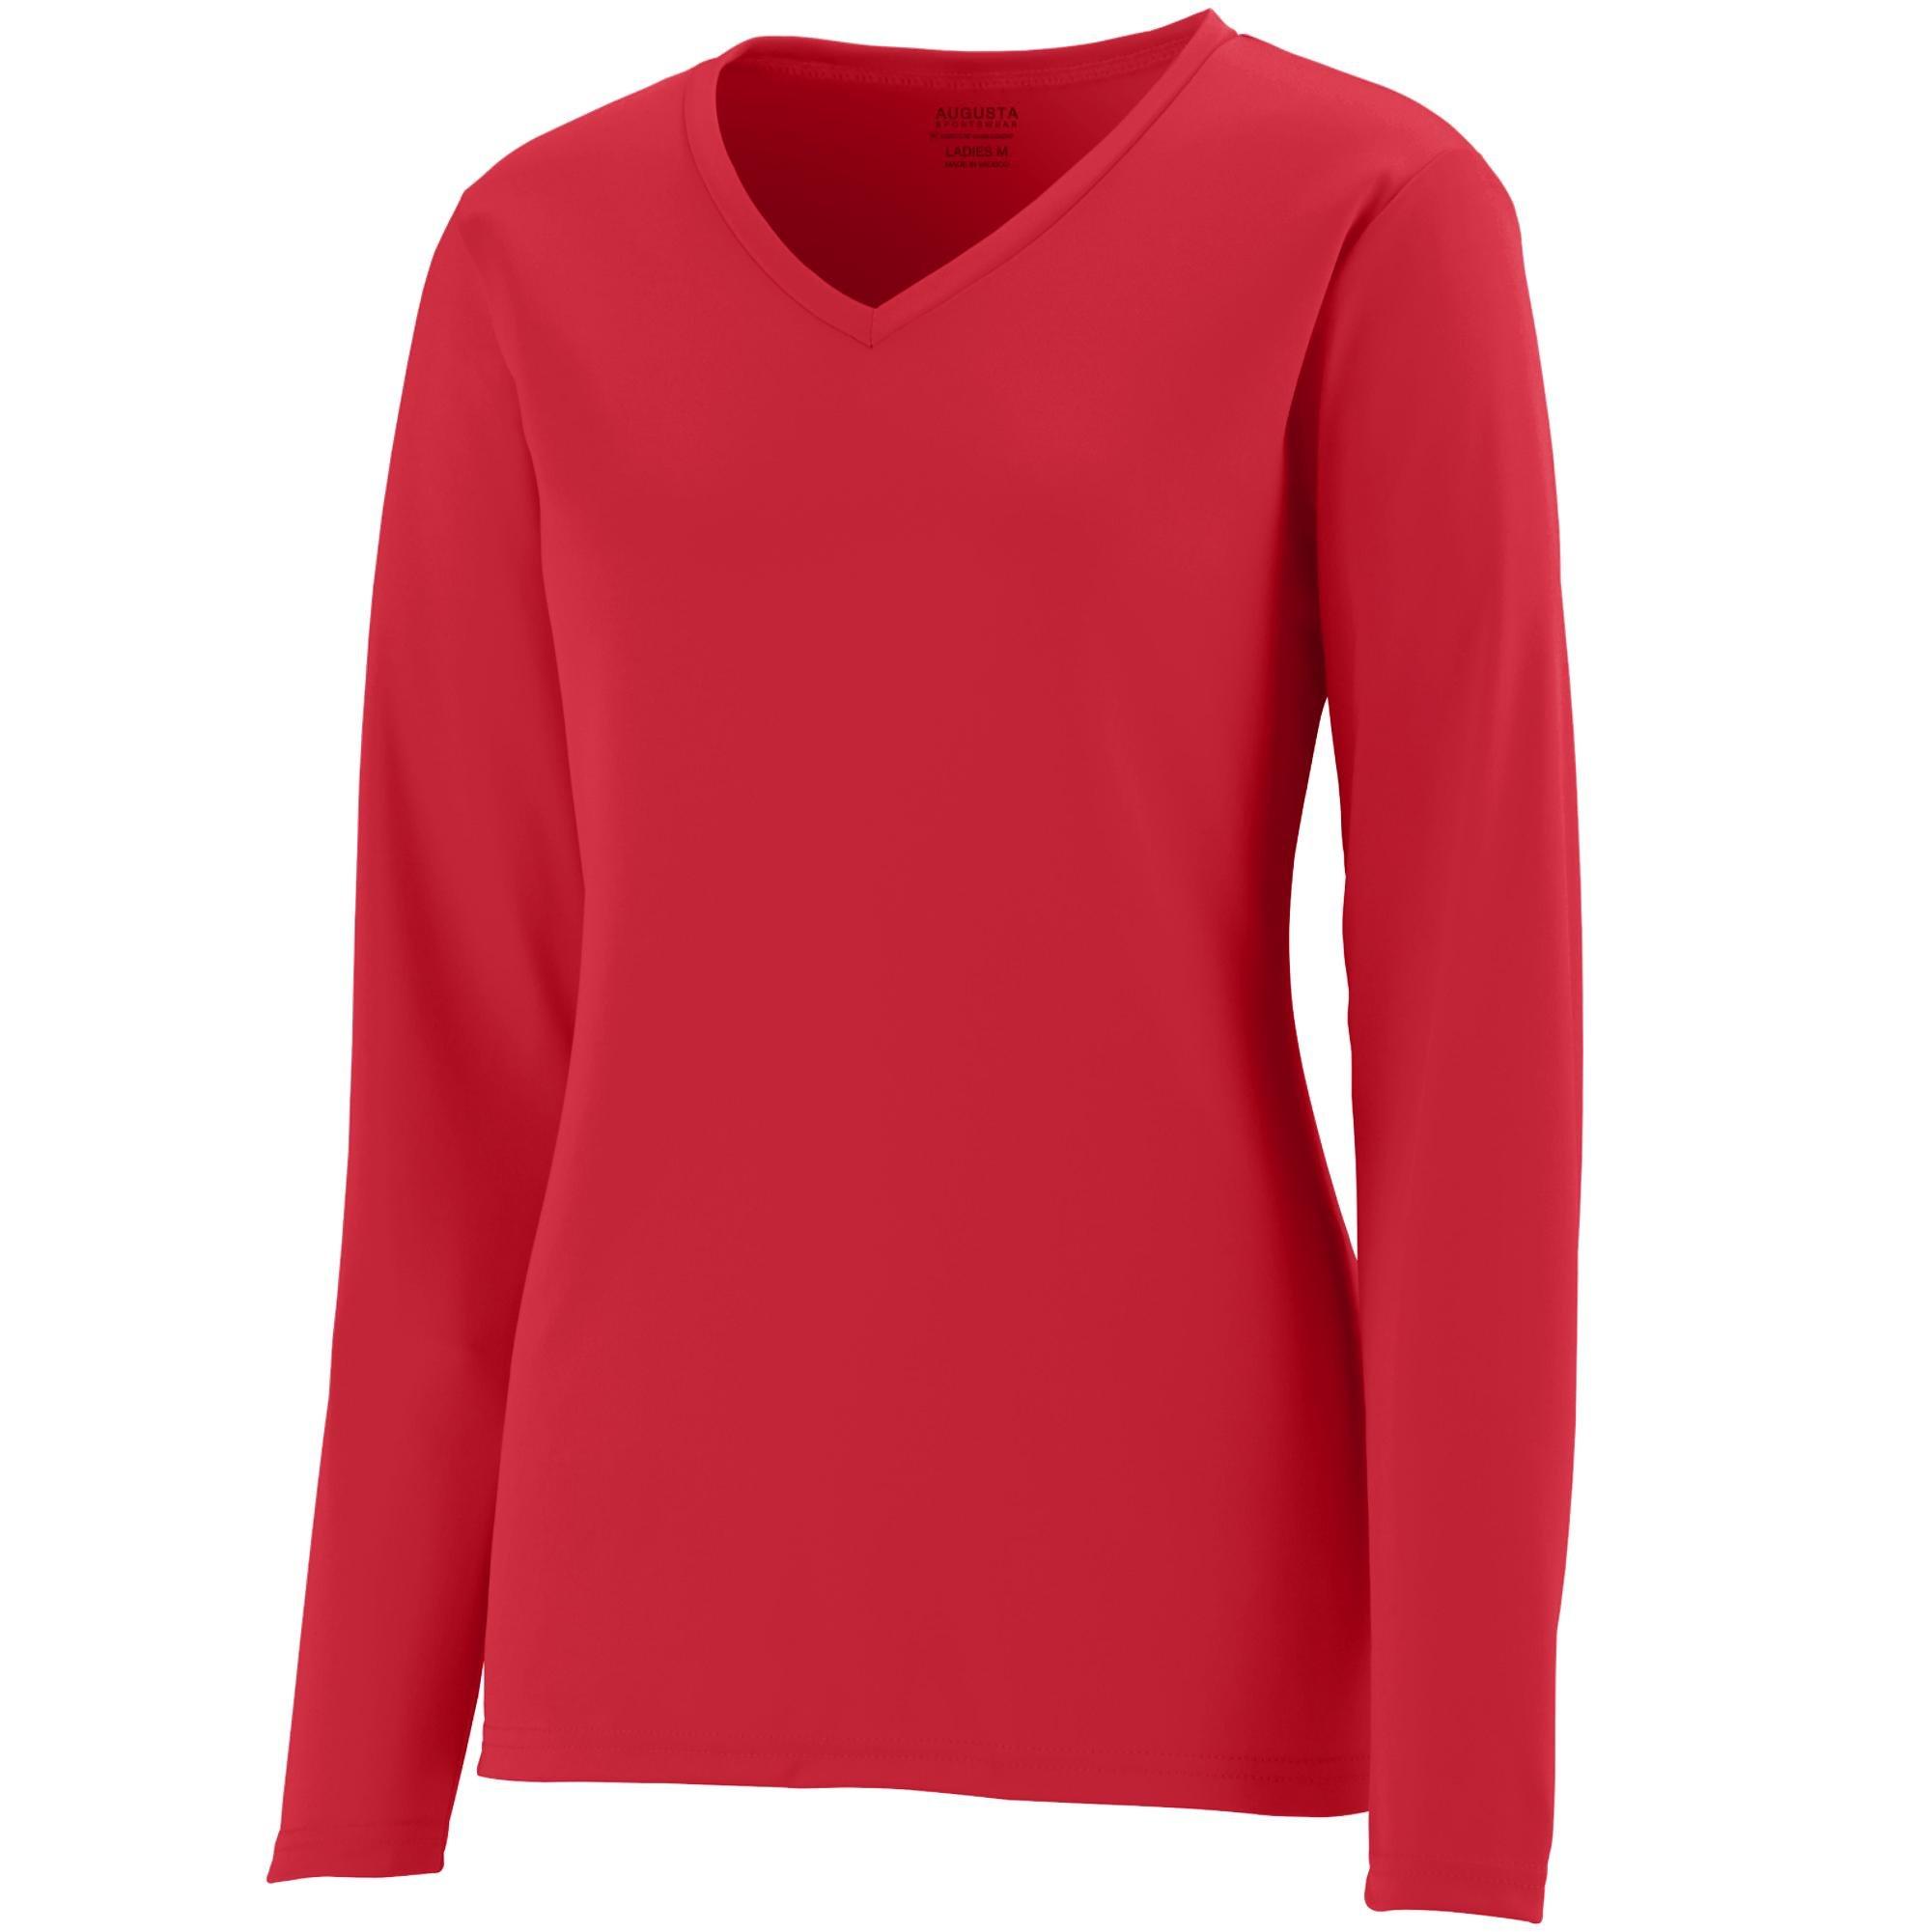 Augusta Sportswear Womens Long Sleeve Wicking T-Shirt, Red, 3X-Large